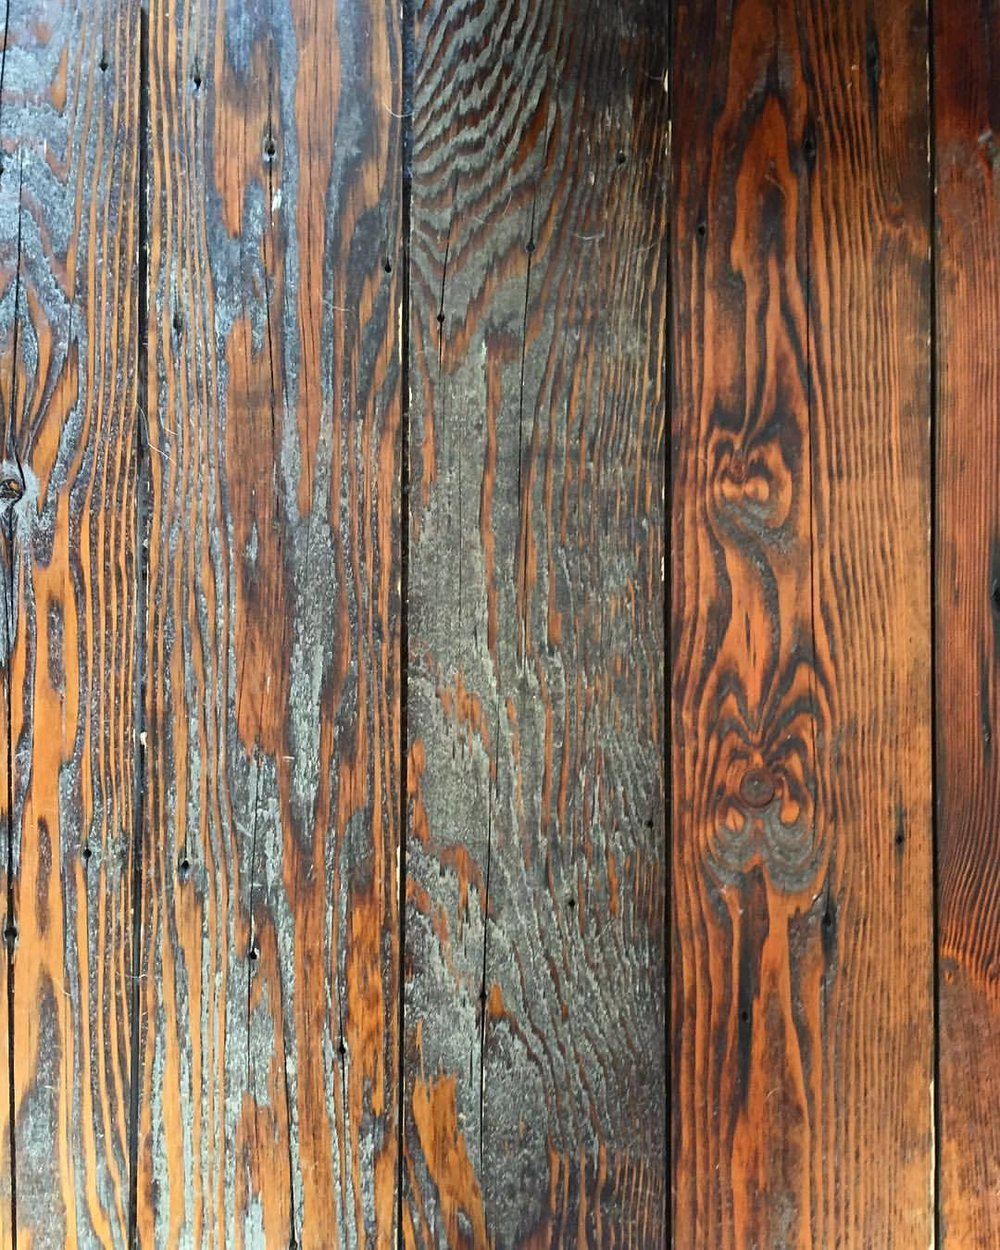 Reclaimed wood floor.  #oldbarns #reclaimedwood #woodworking  (at Point Reyes National Seashore)